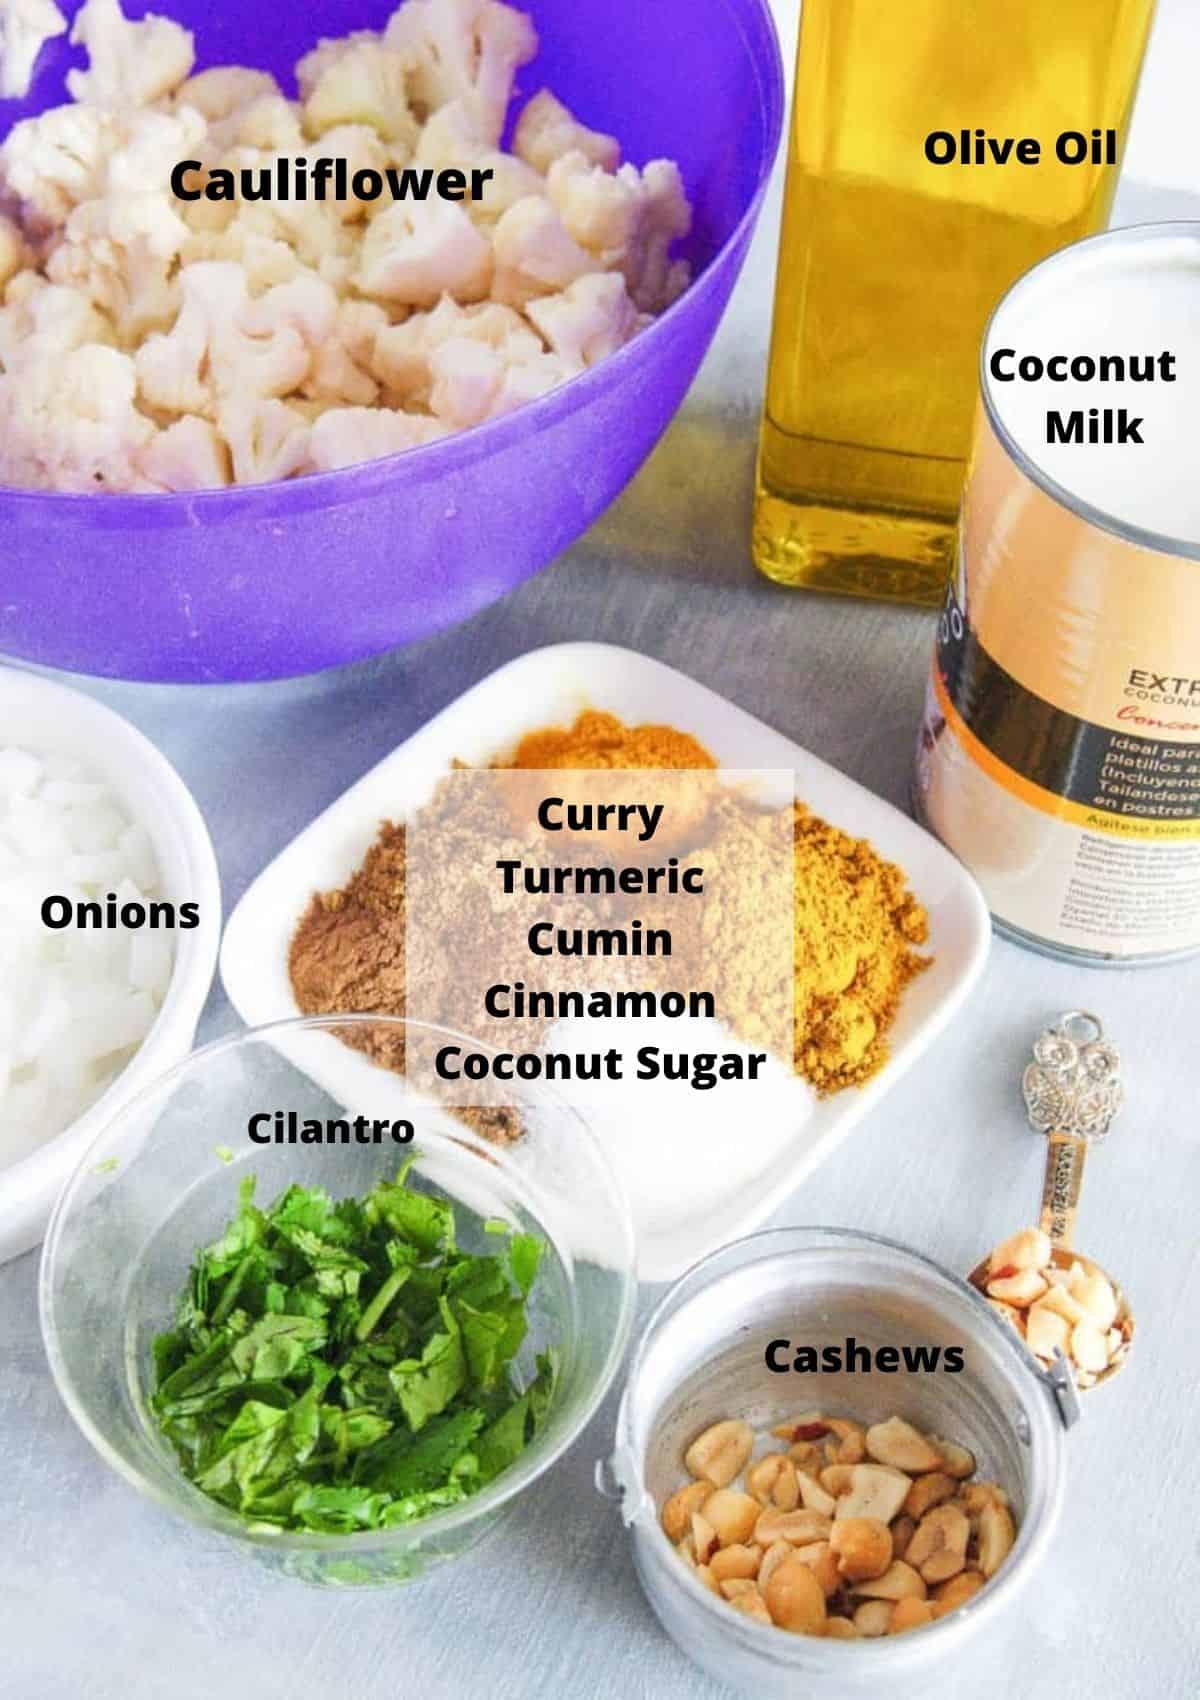 Cauliflower soup ingredients: Chopped cauliflower florets, olive oil, coconut milk, spices, cashews, cilantro, onions.